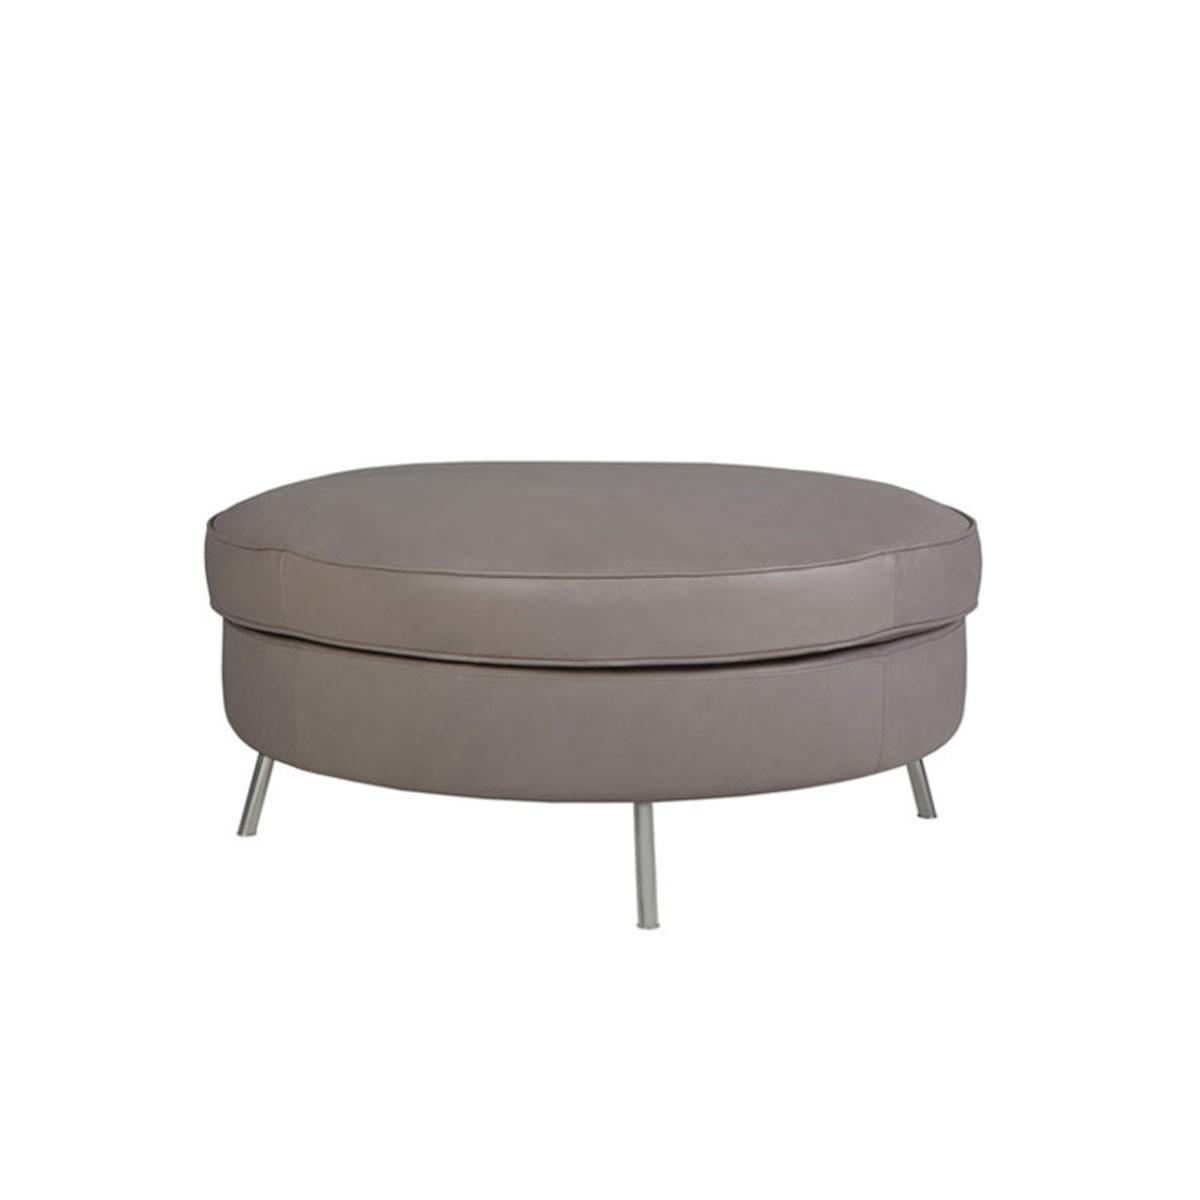 Jules footstool - 96cm